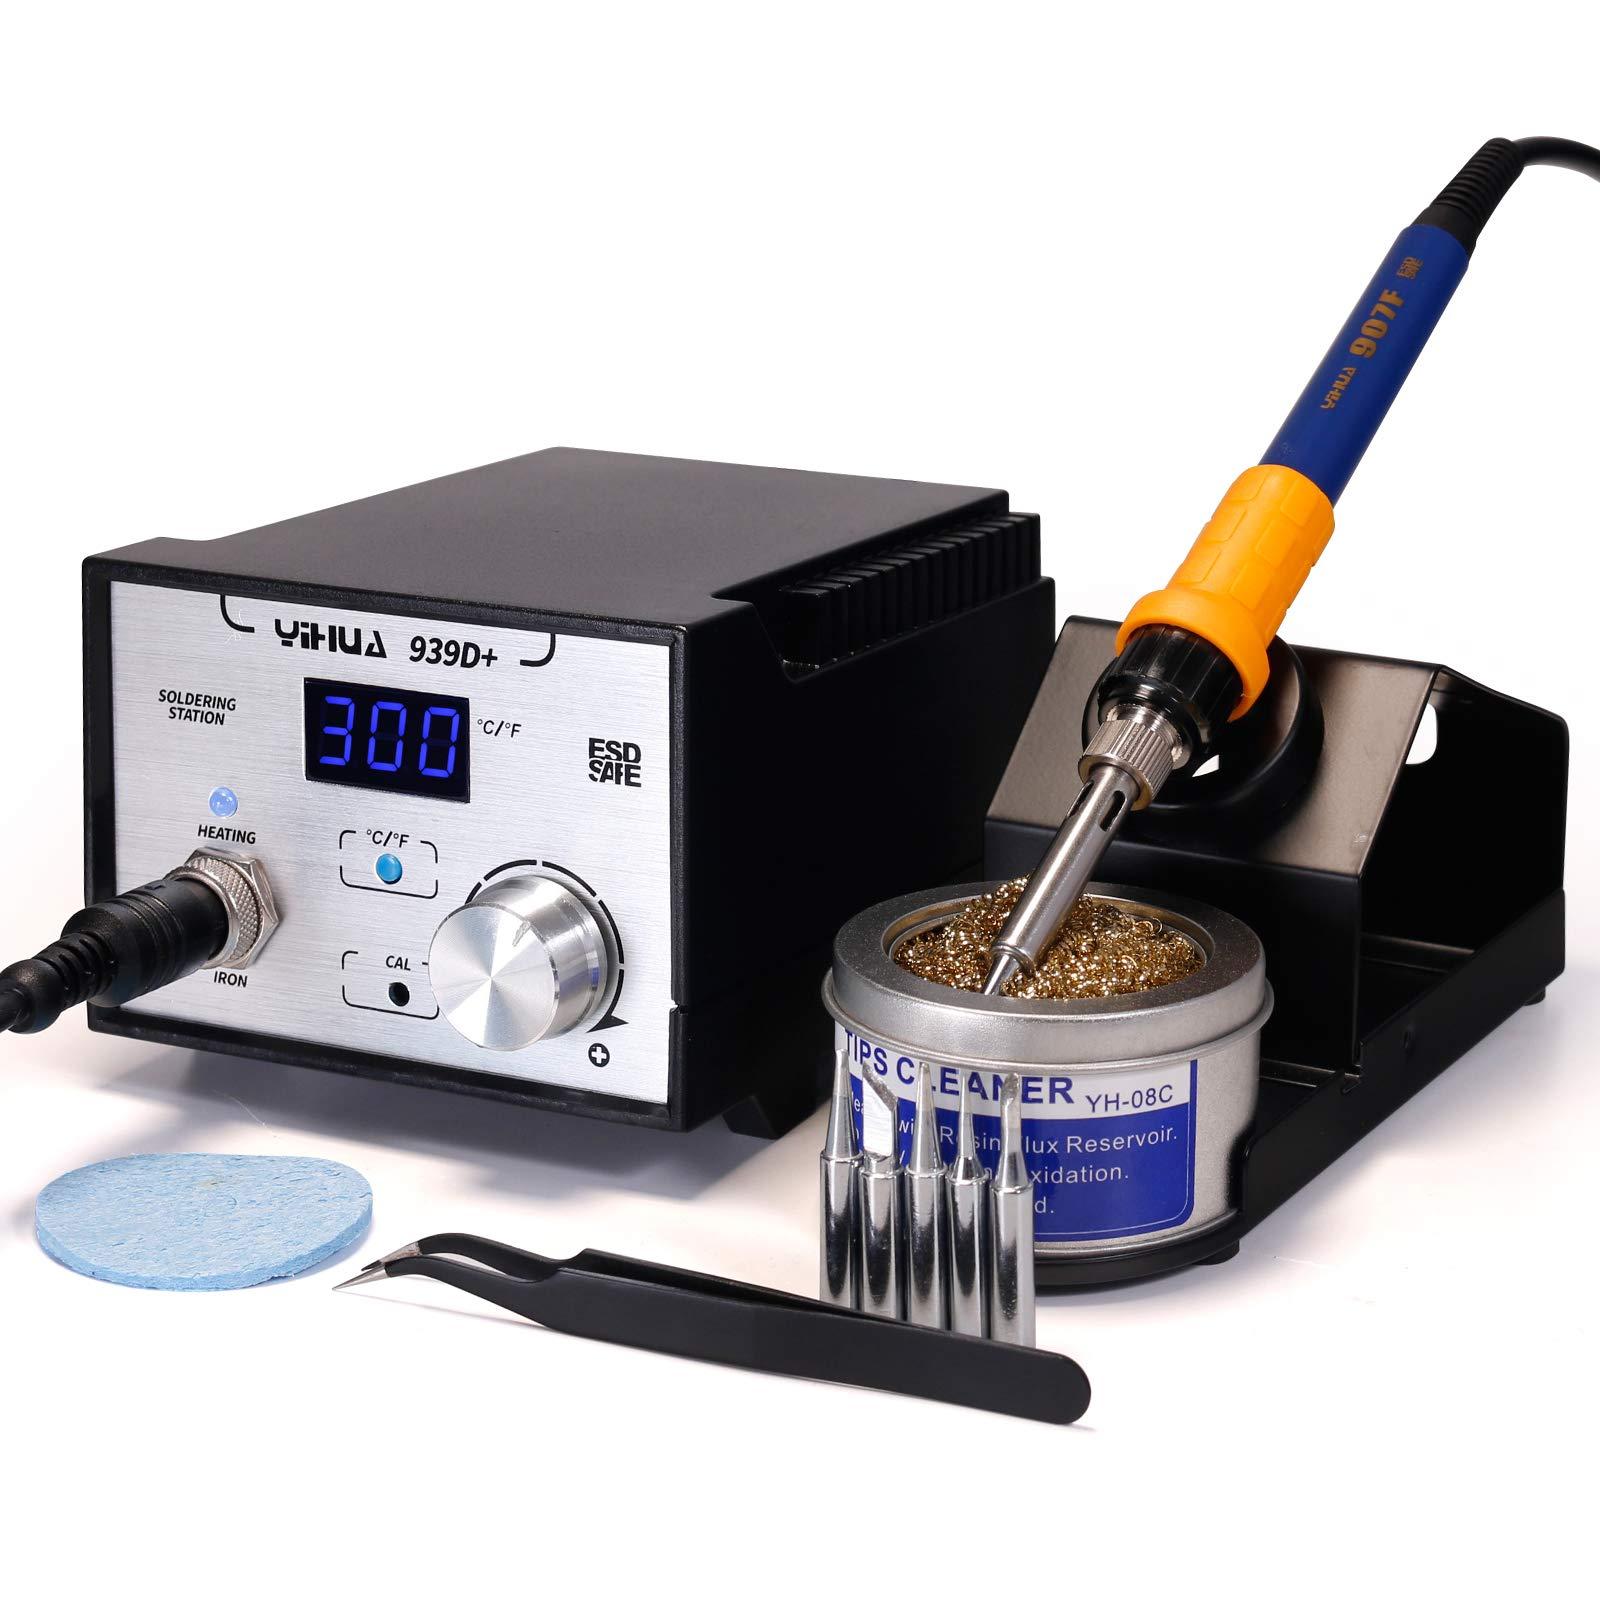 YIHUA 939D+ Professional 75W Digital Soldering Iron Station ESD SAFE Lead Free °F /°C